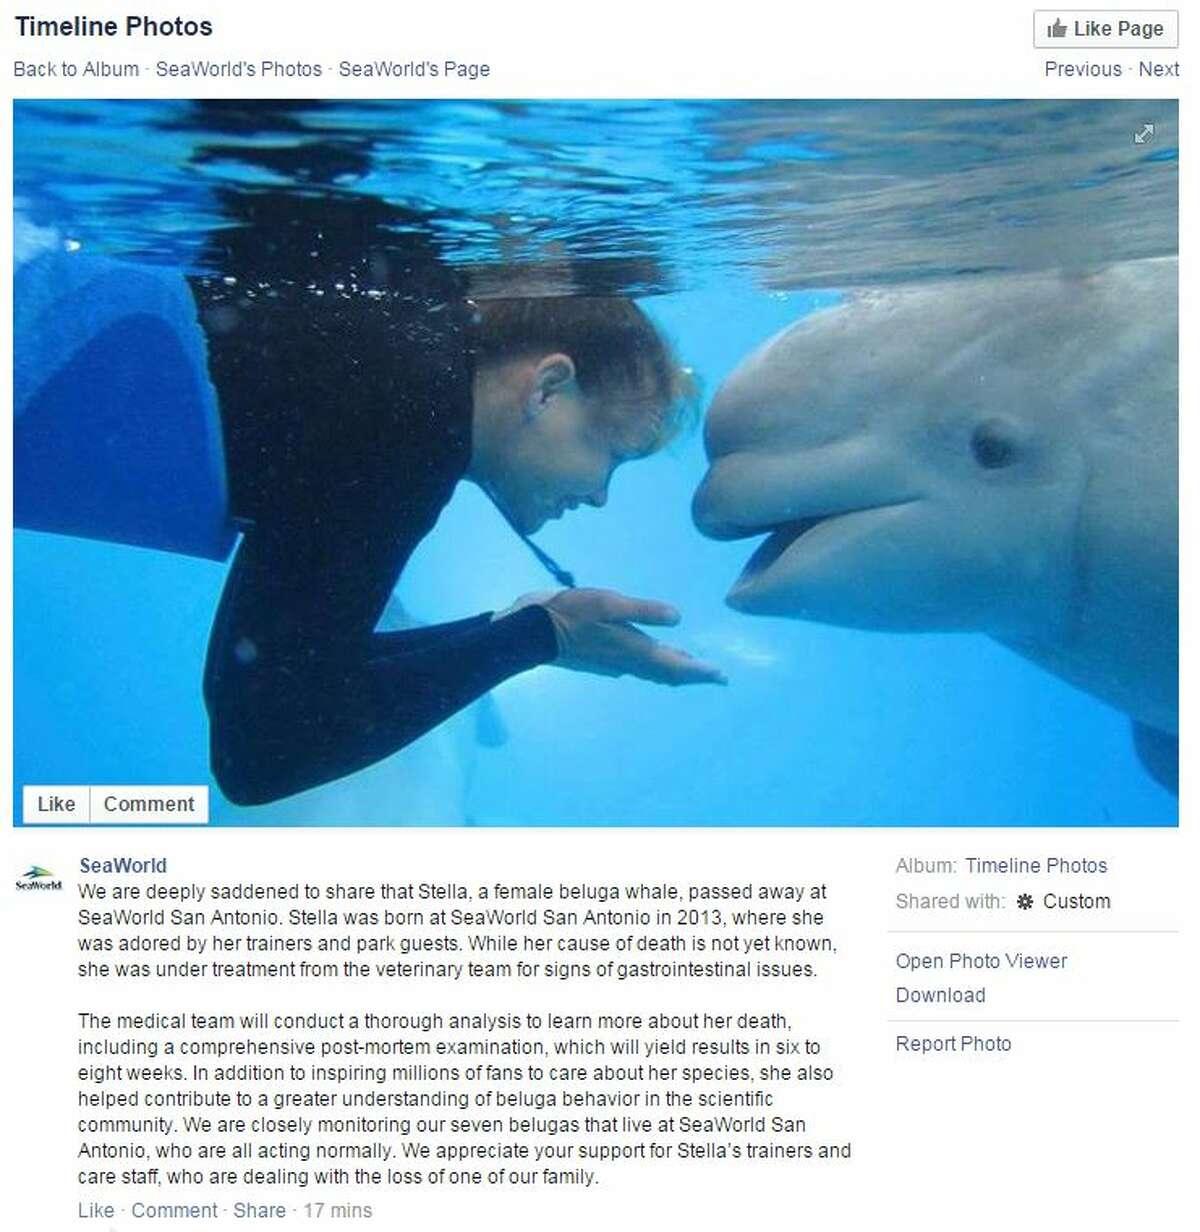 Stella, a two-year-old beluga whale at SeaWorld San Antonio, died Nov. 13, 2015.